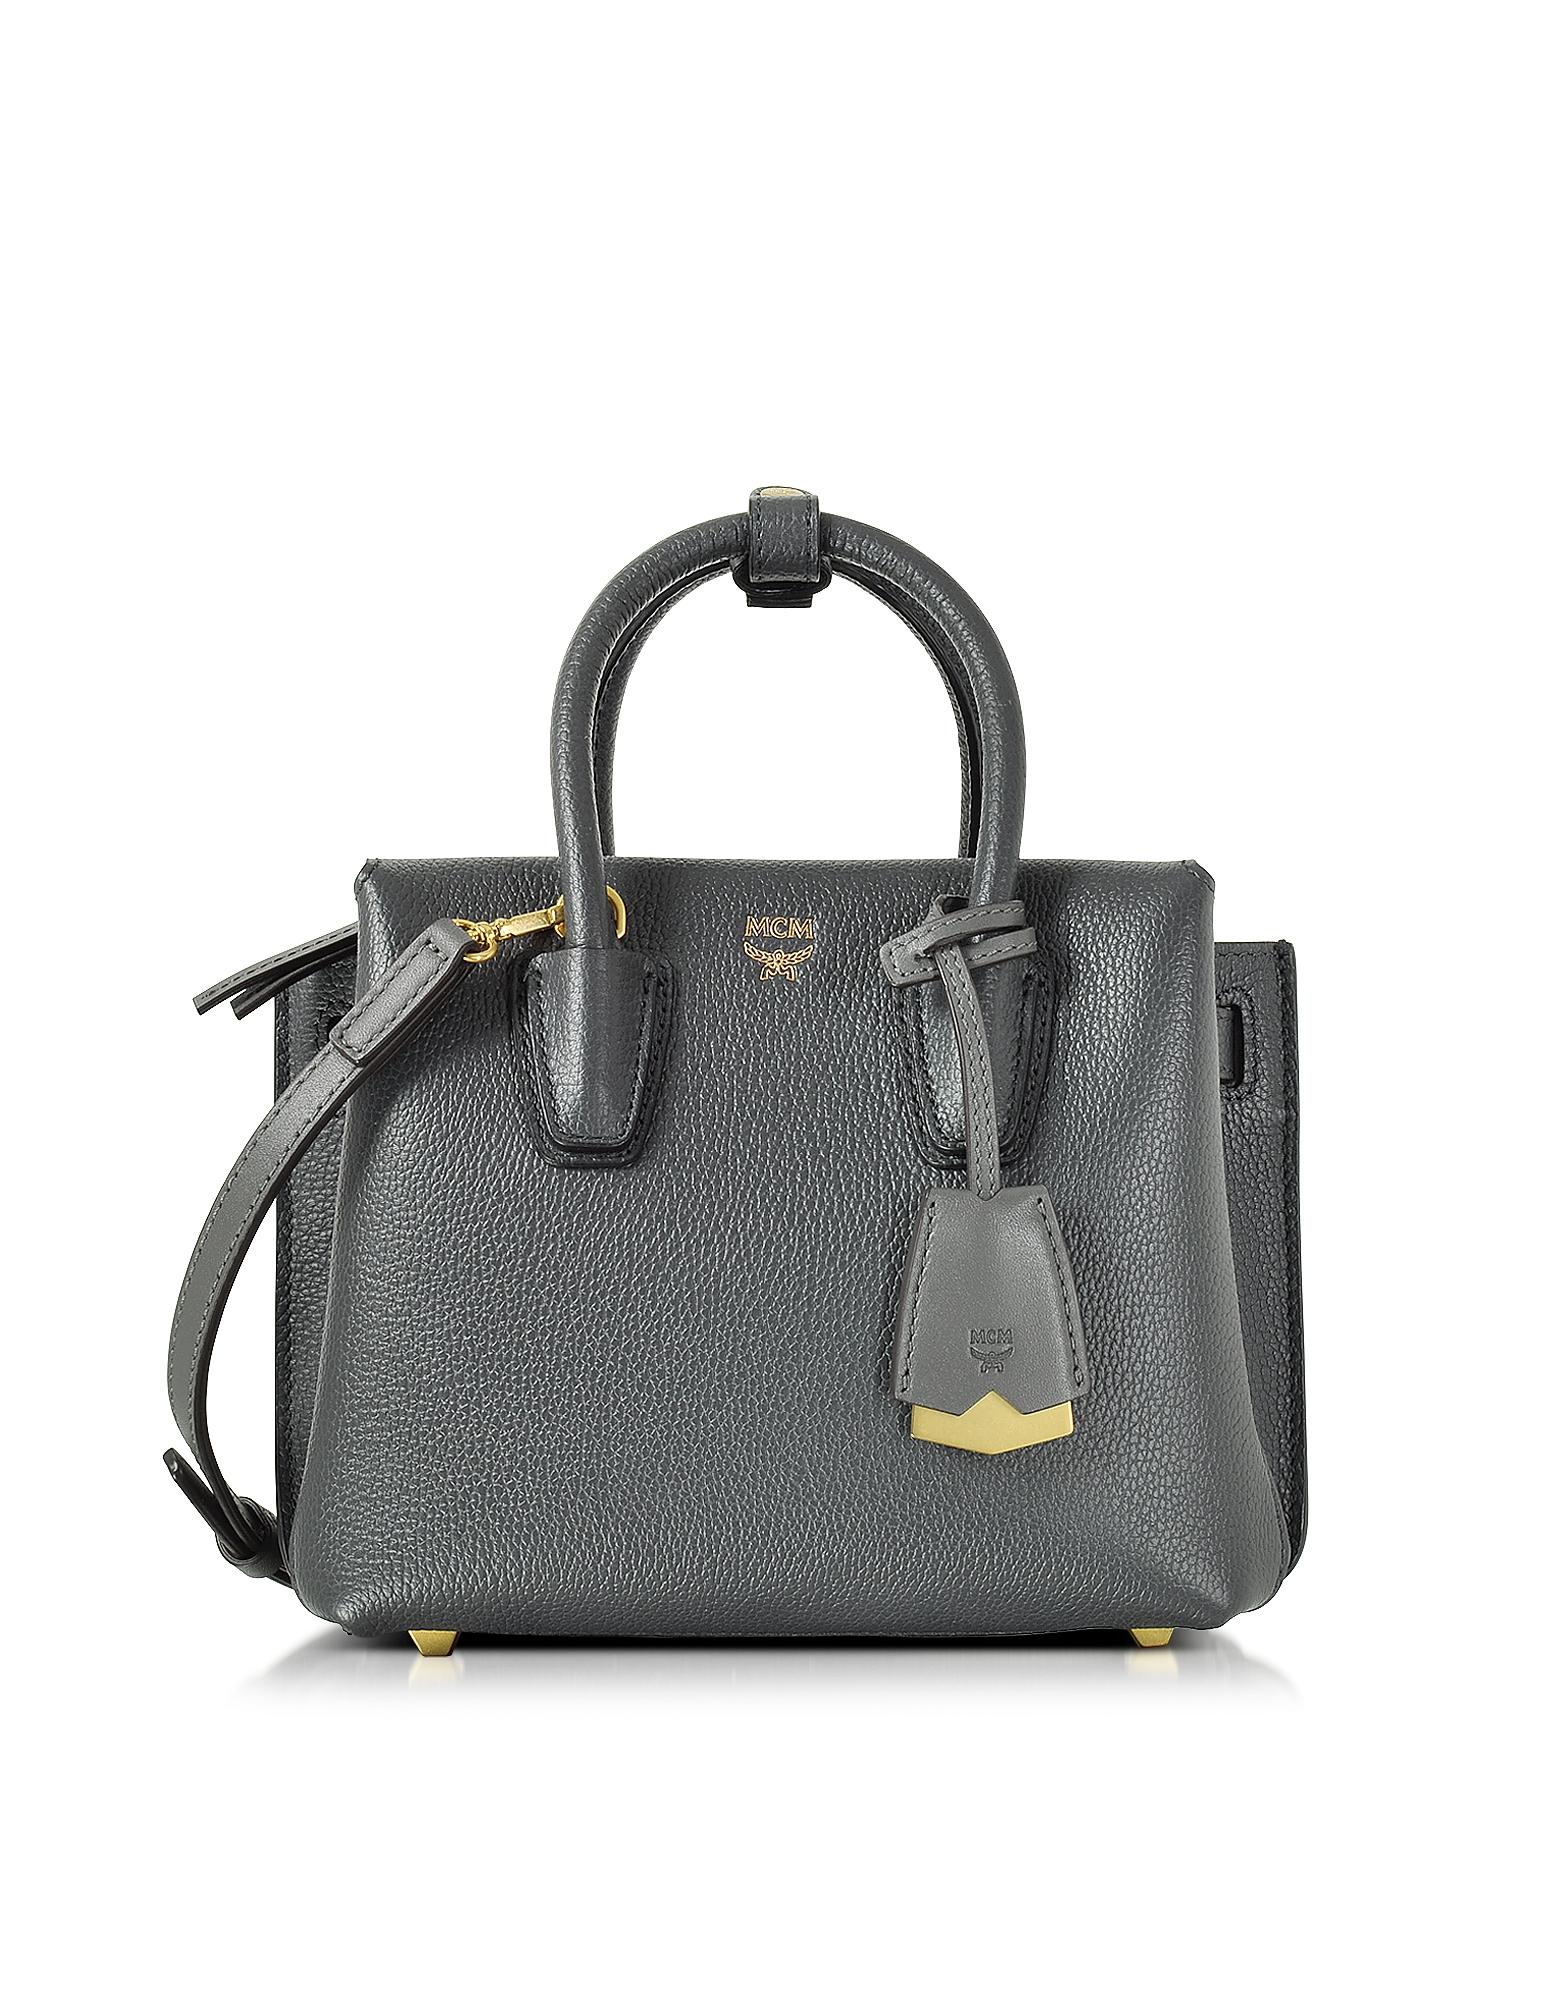 MCM Handbags, Milla Phantom Grey Leather Mini Tote